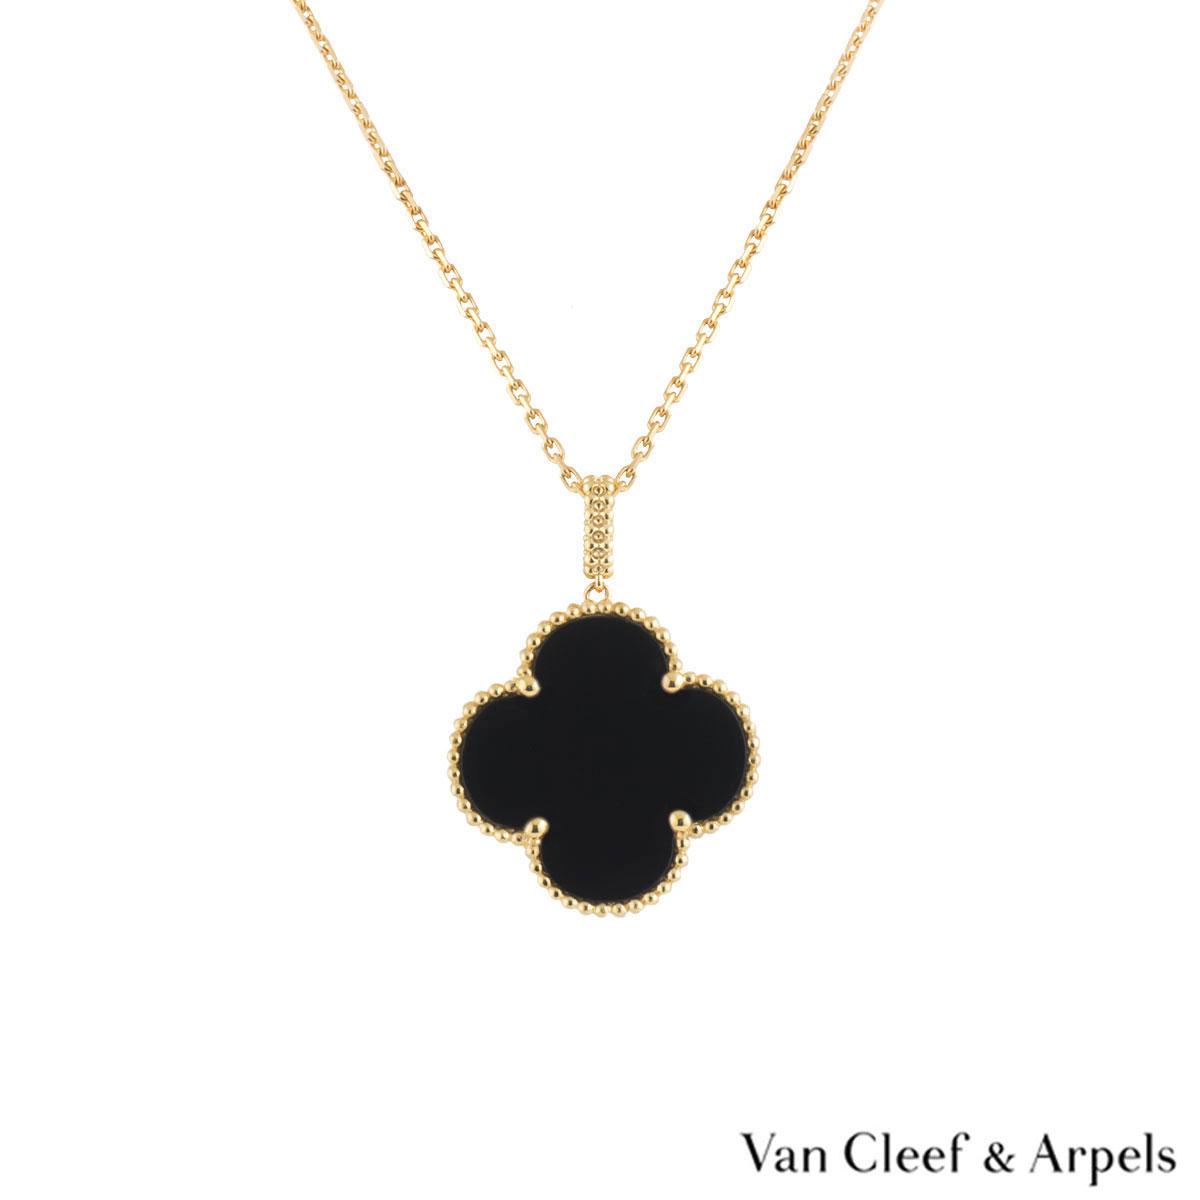 Van Cleef & Arpels Yellow Gold Onyx Magic Alhambra Necklace VCARO49M00